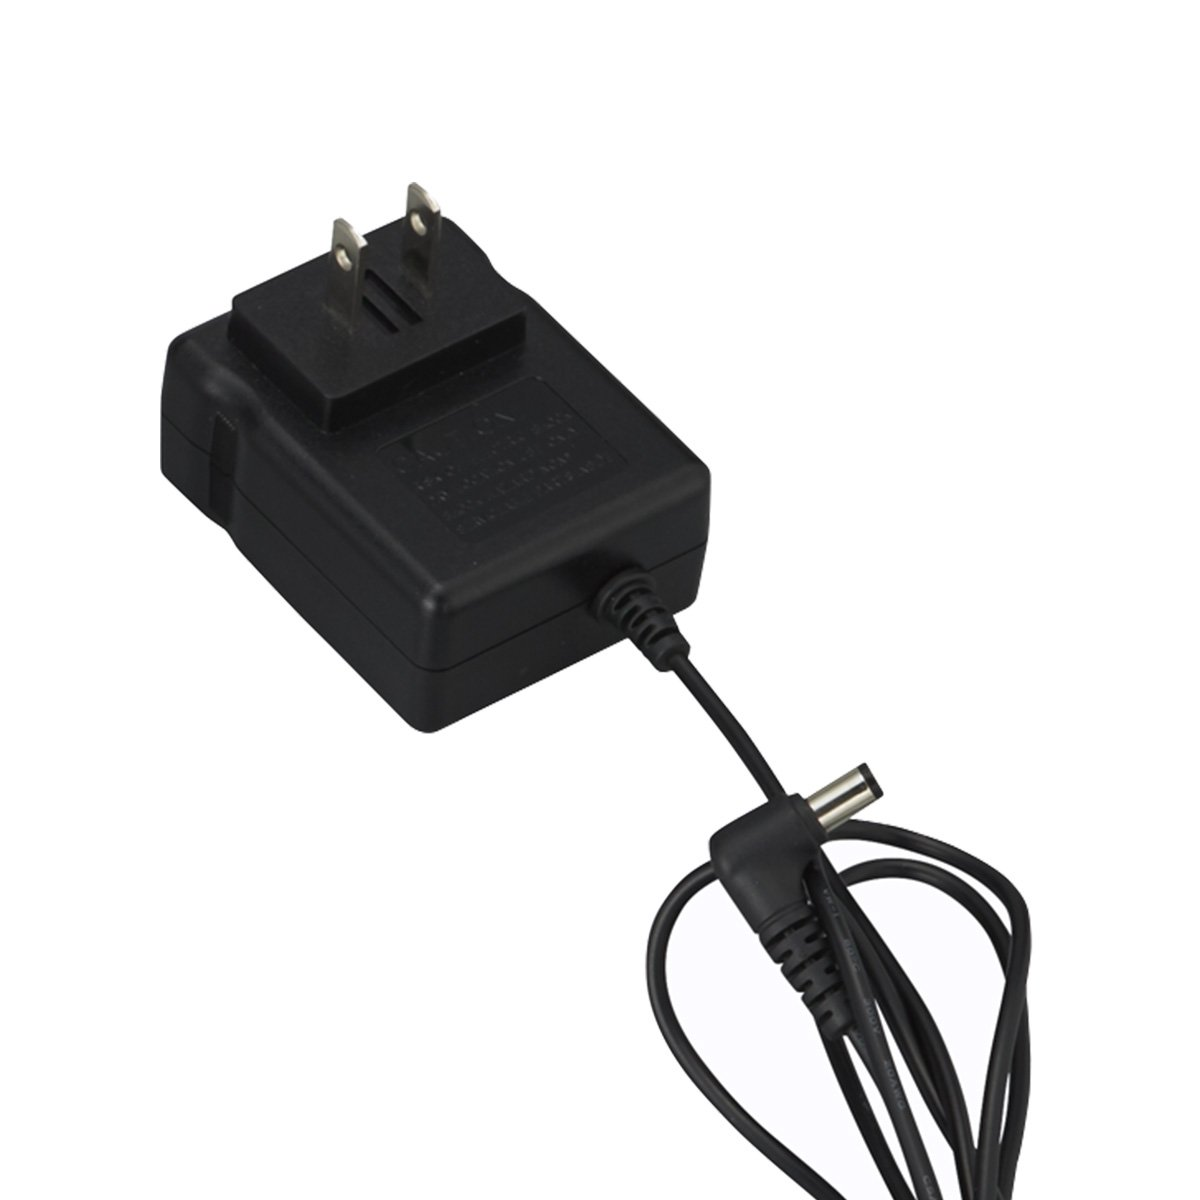 AC Adapter for BabySmile Nasal Aspirator S-503 by BabySmile